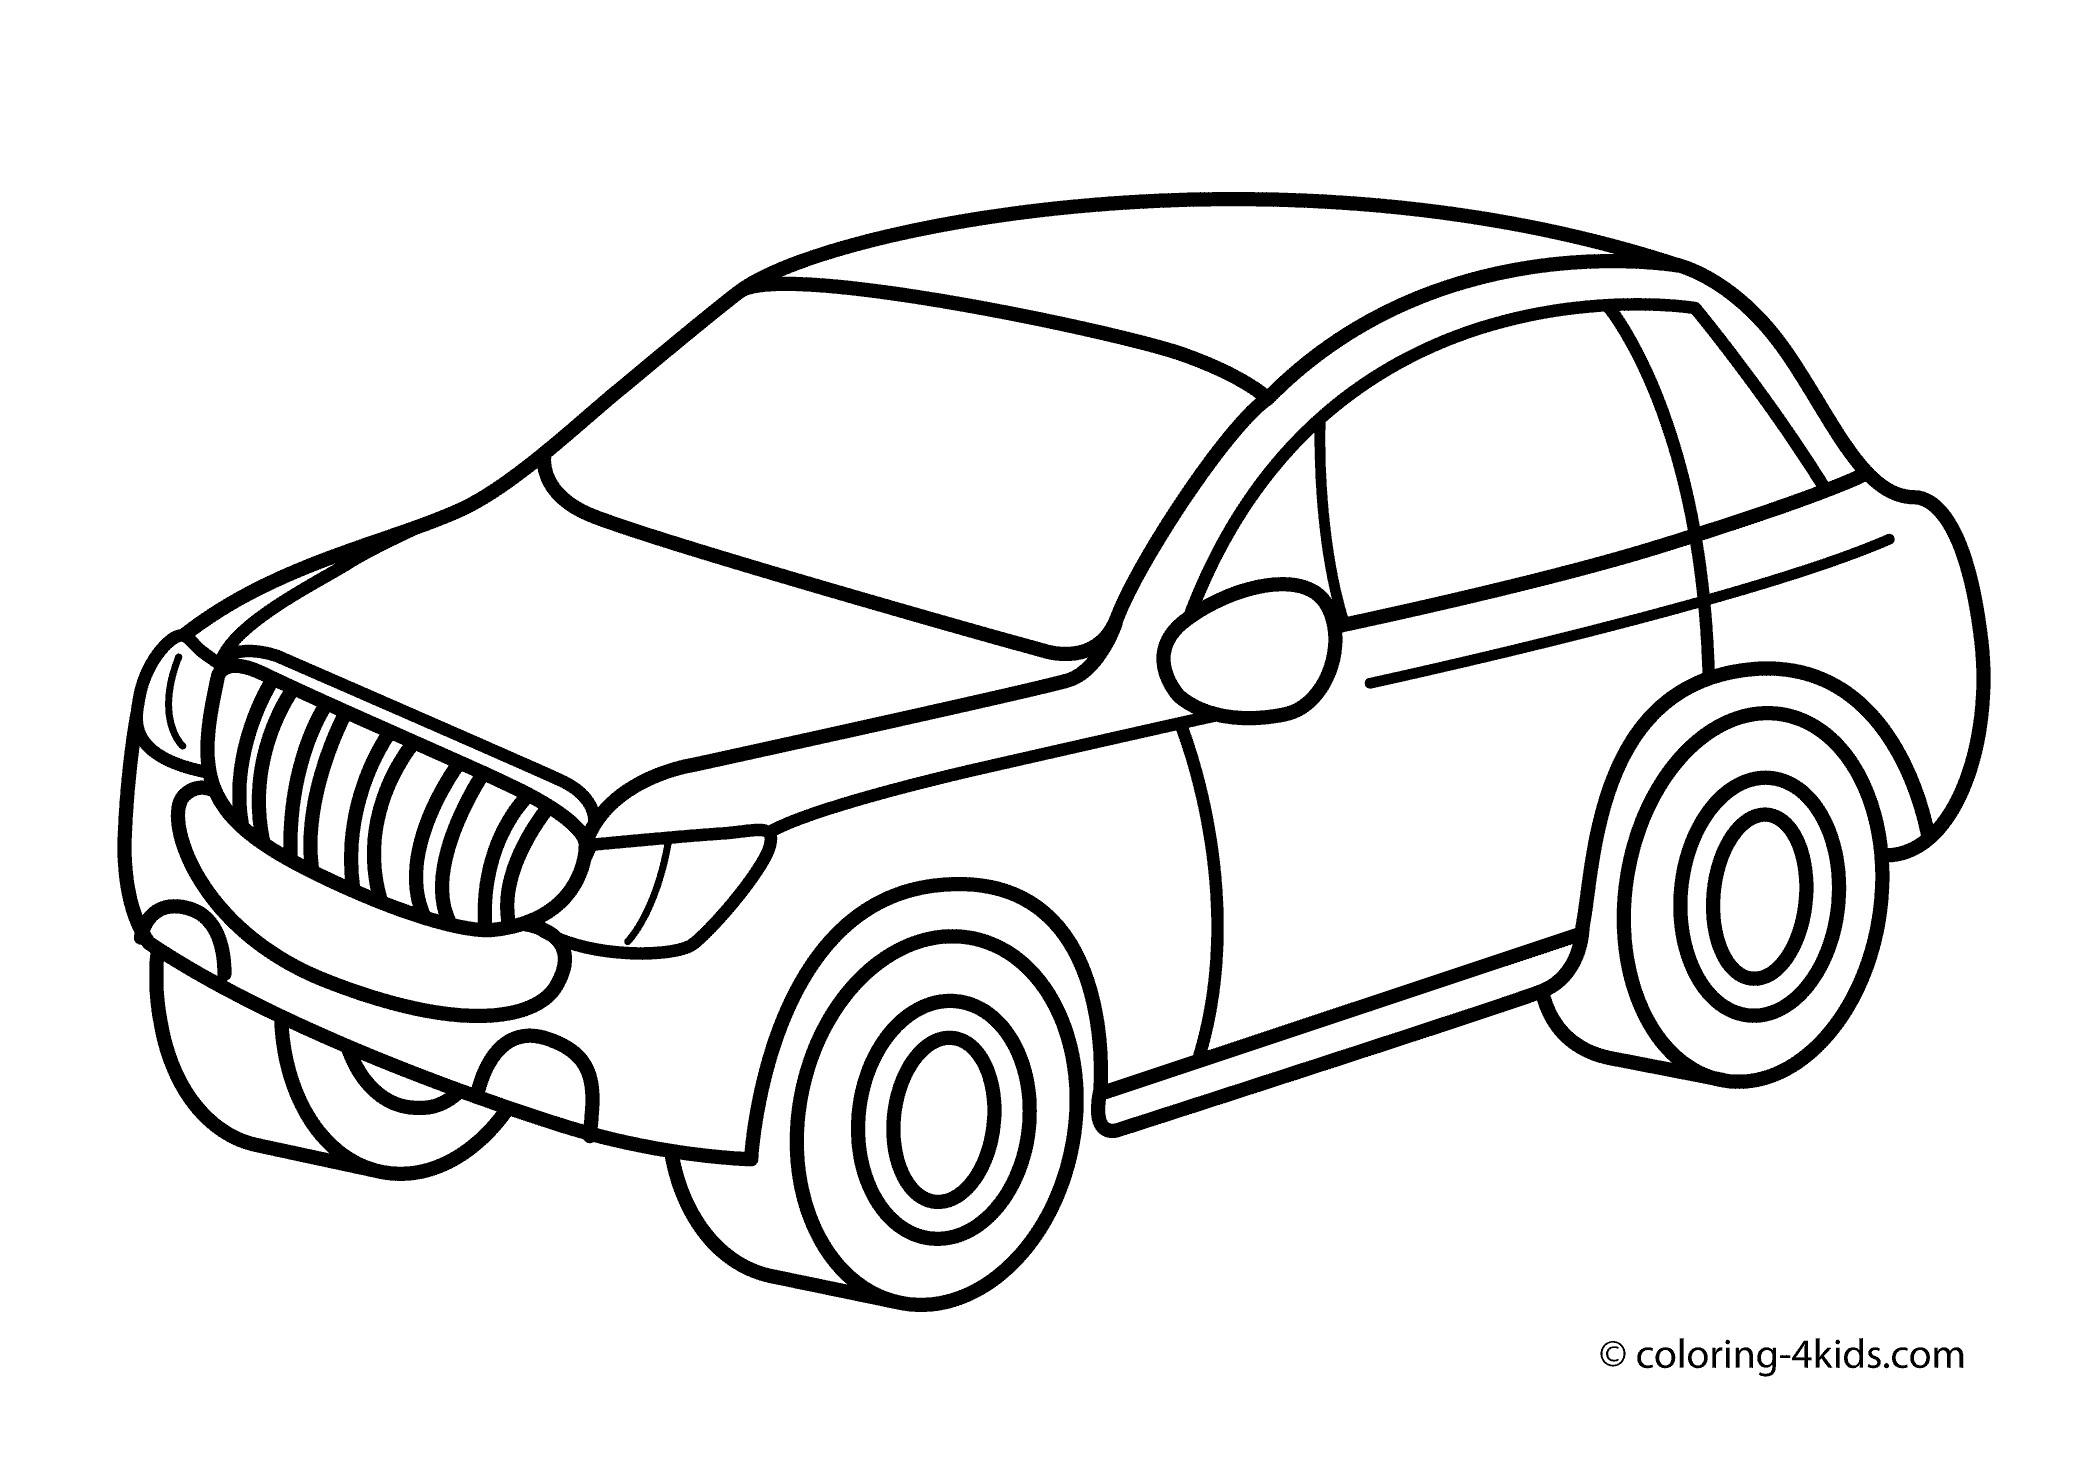 2004 Jeep Wrangler Engine Diagram Jeepcar Wiring Diagram Page 17